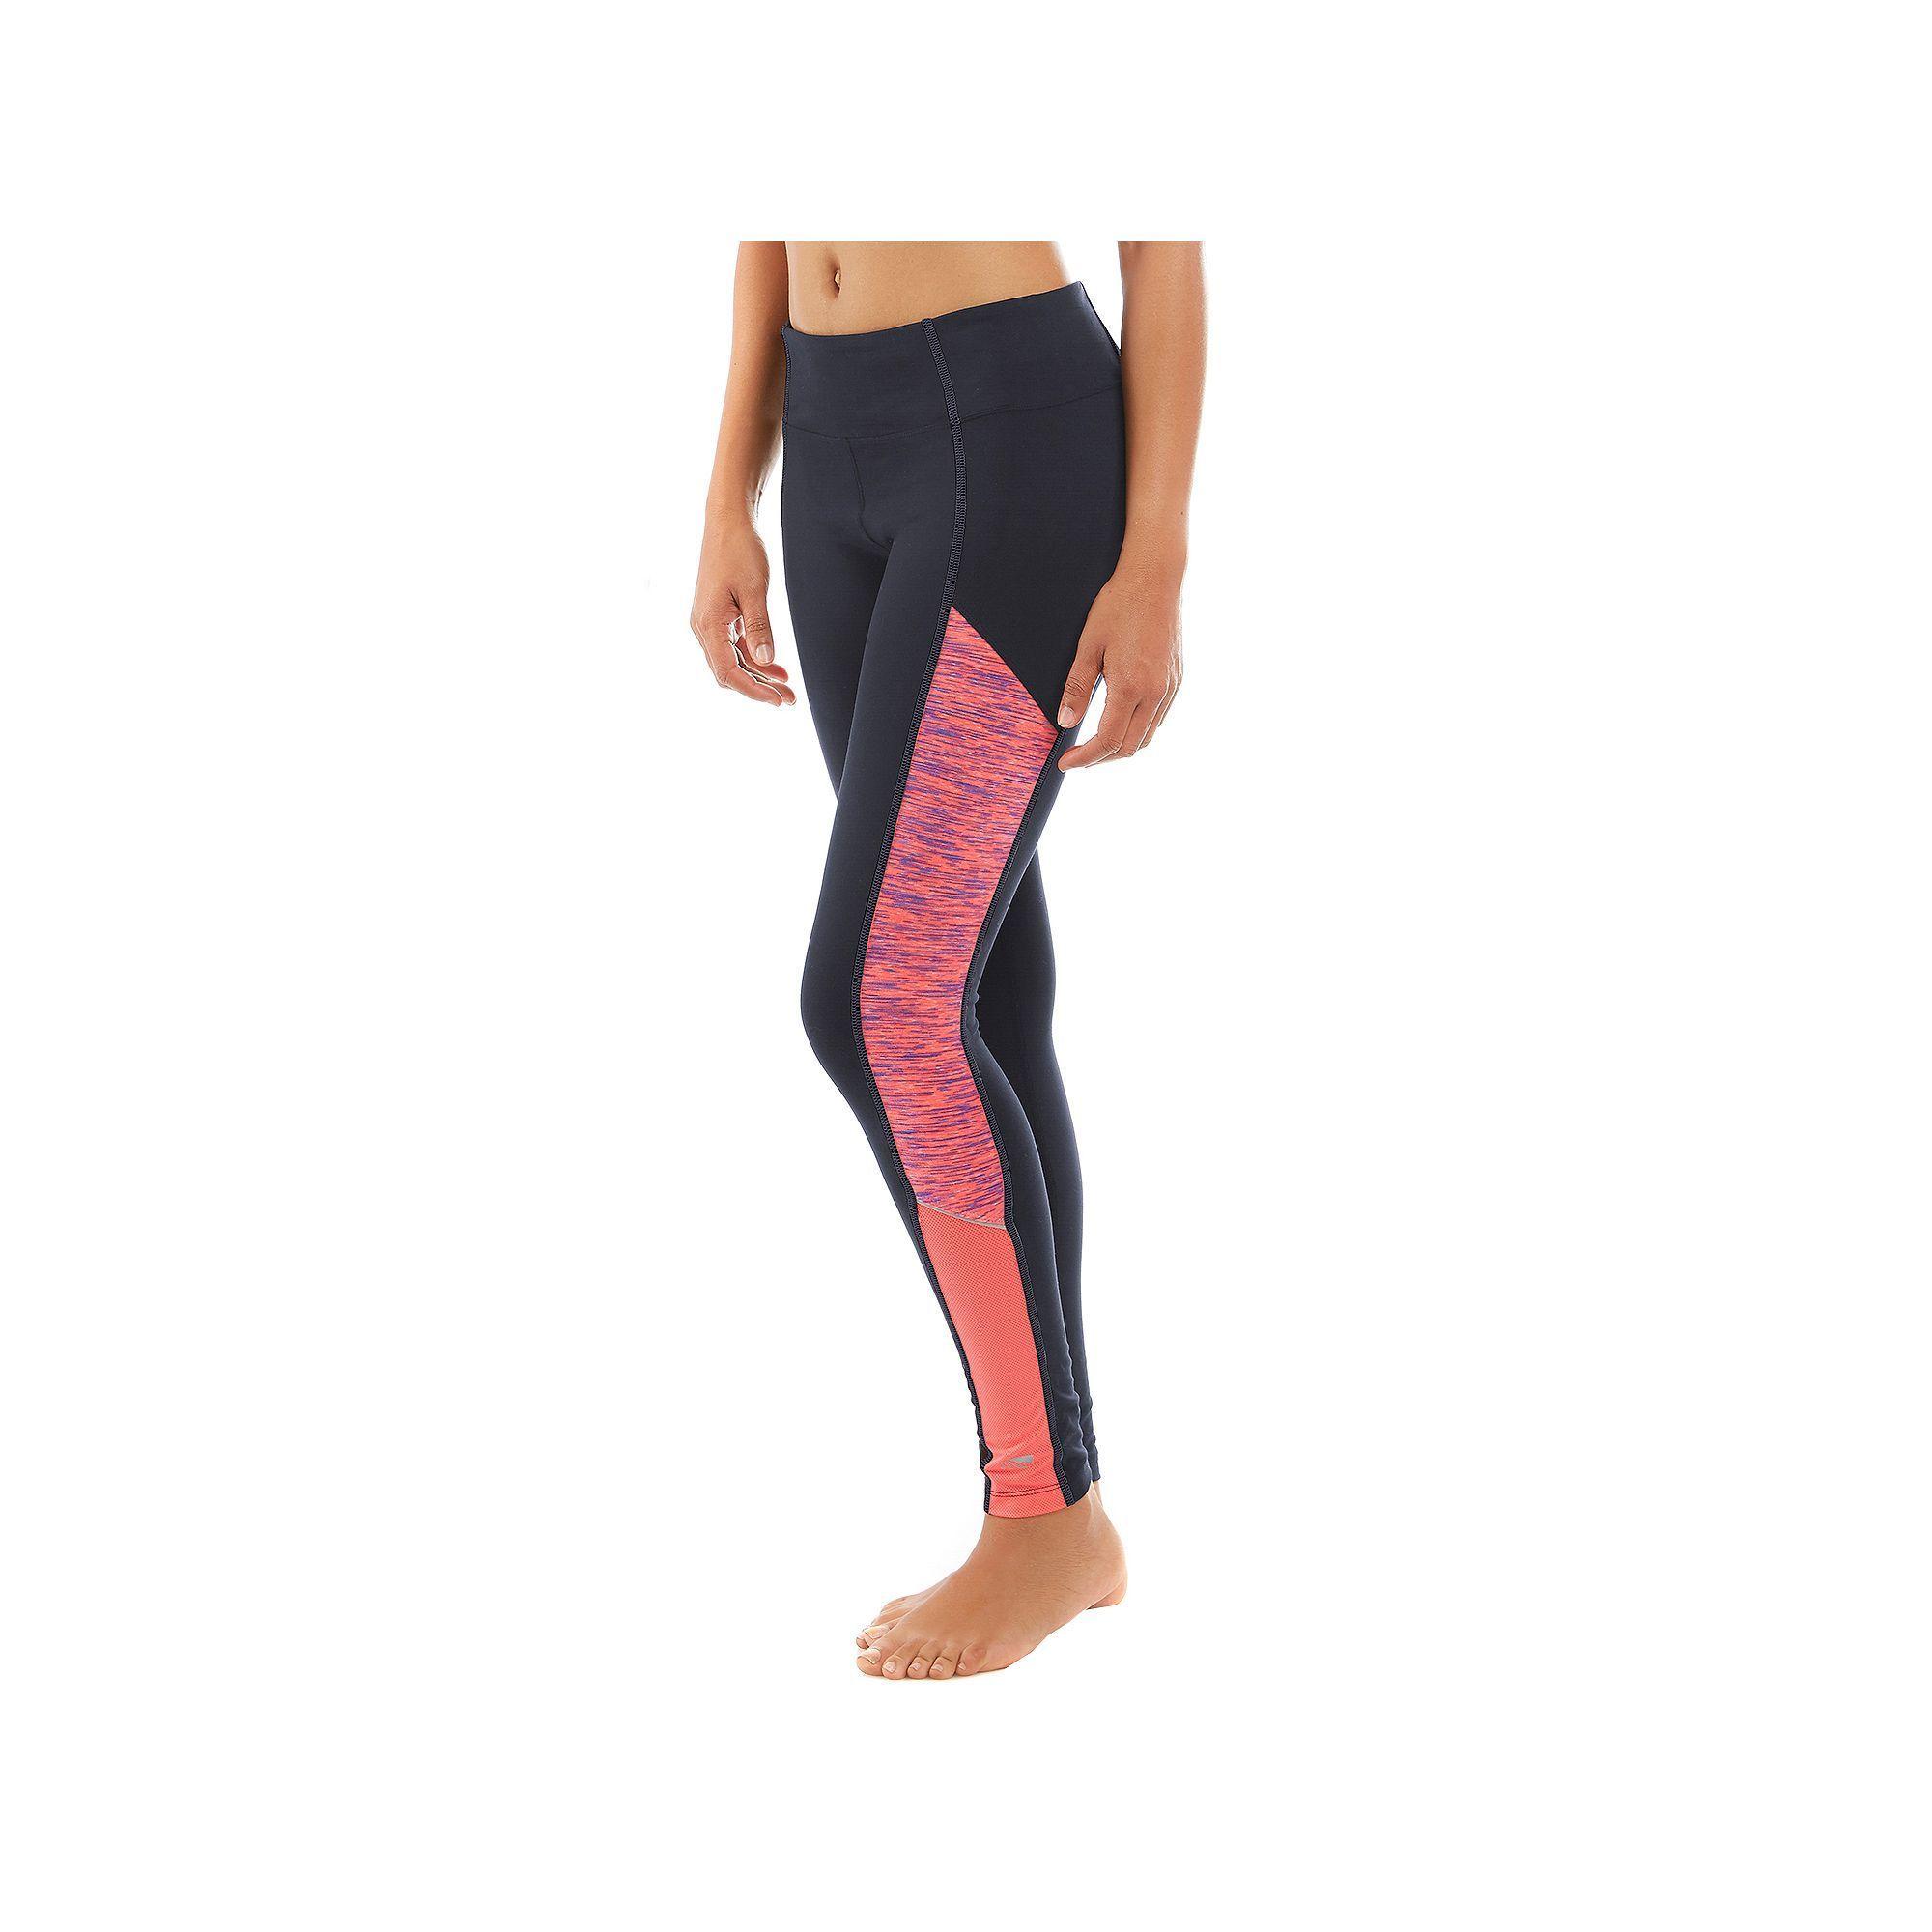 Marika womenus marika jordan space dyed leggings spaces and products